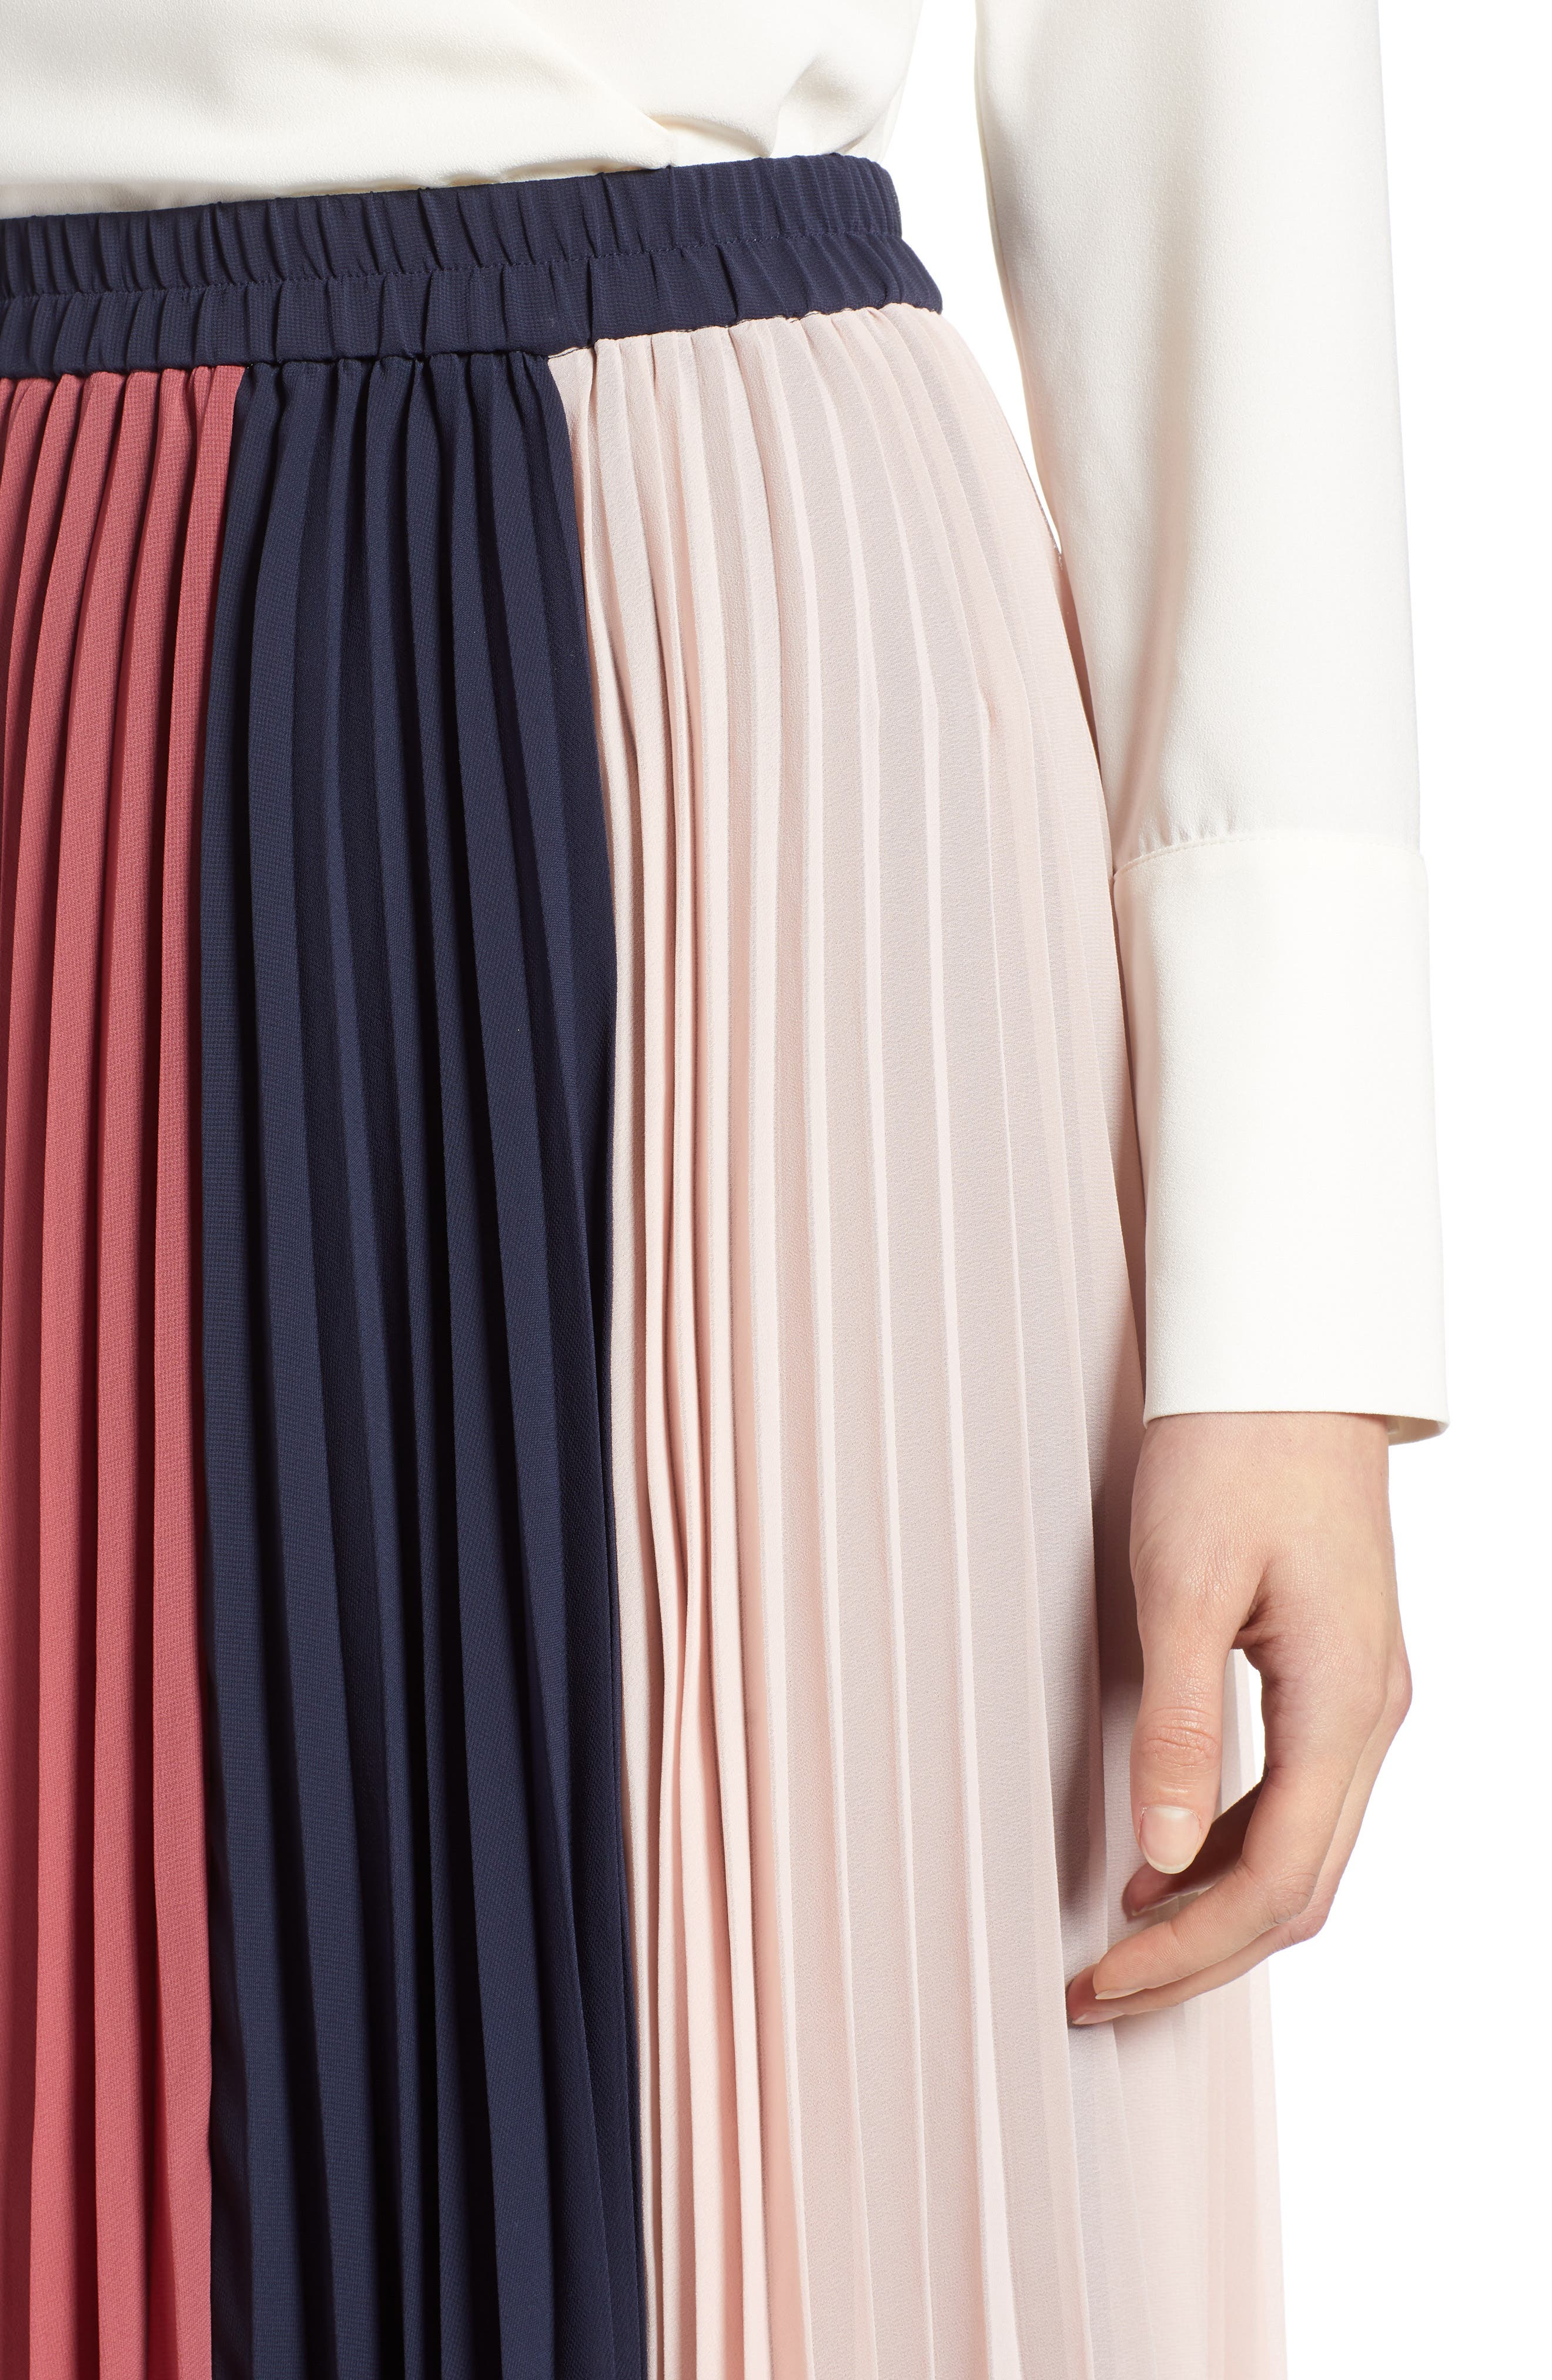 x Atlantic-Pacific Colorblock Pleated Midi Skirt,                             Alternate thumbnail 5, color,                             PINK- NAVY COLORBLOCK